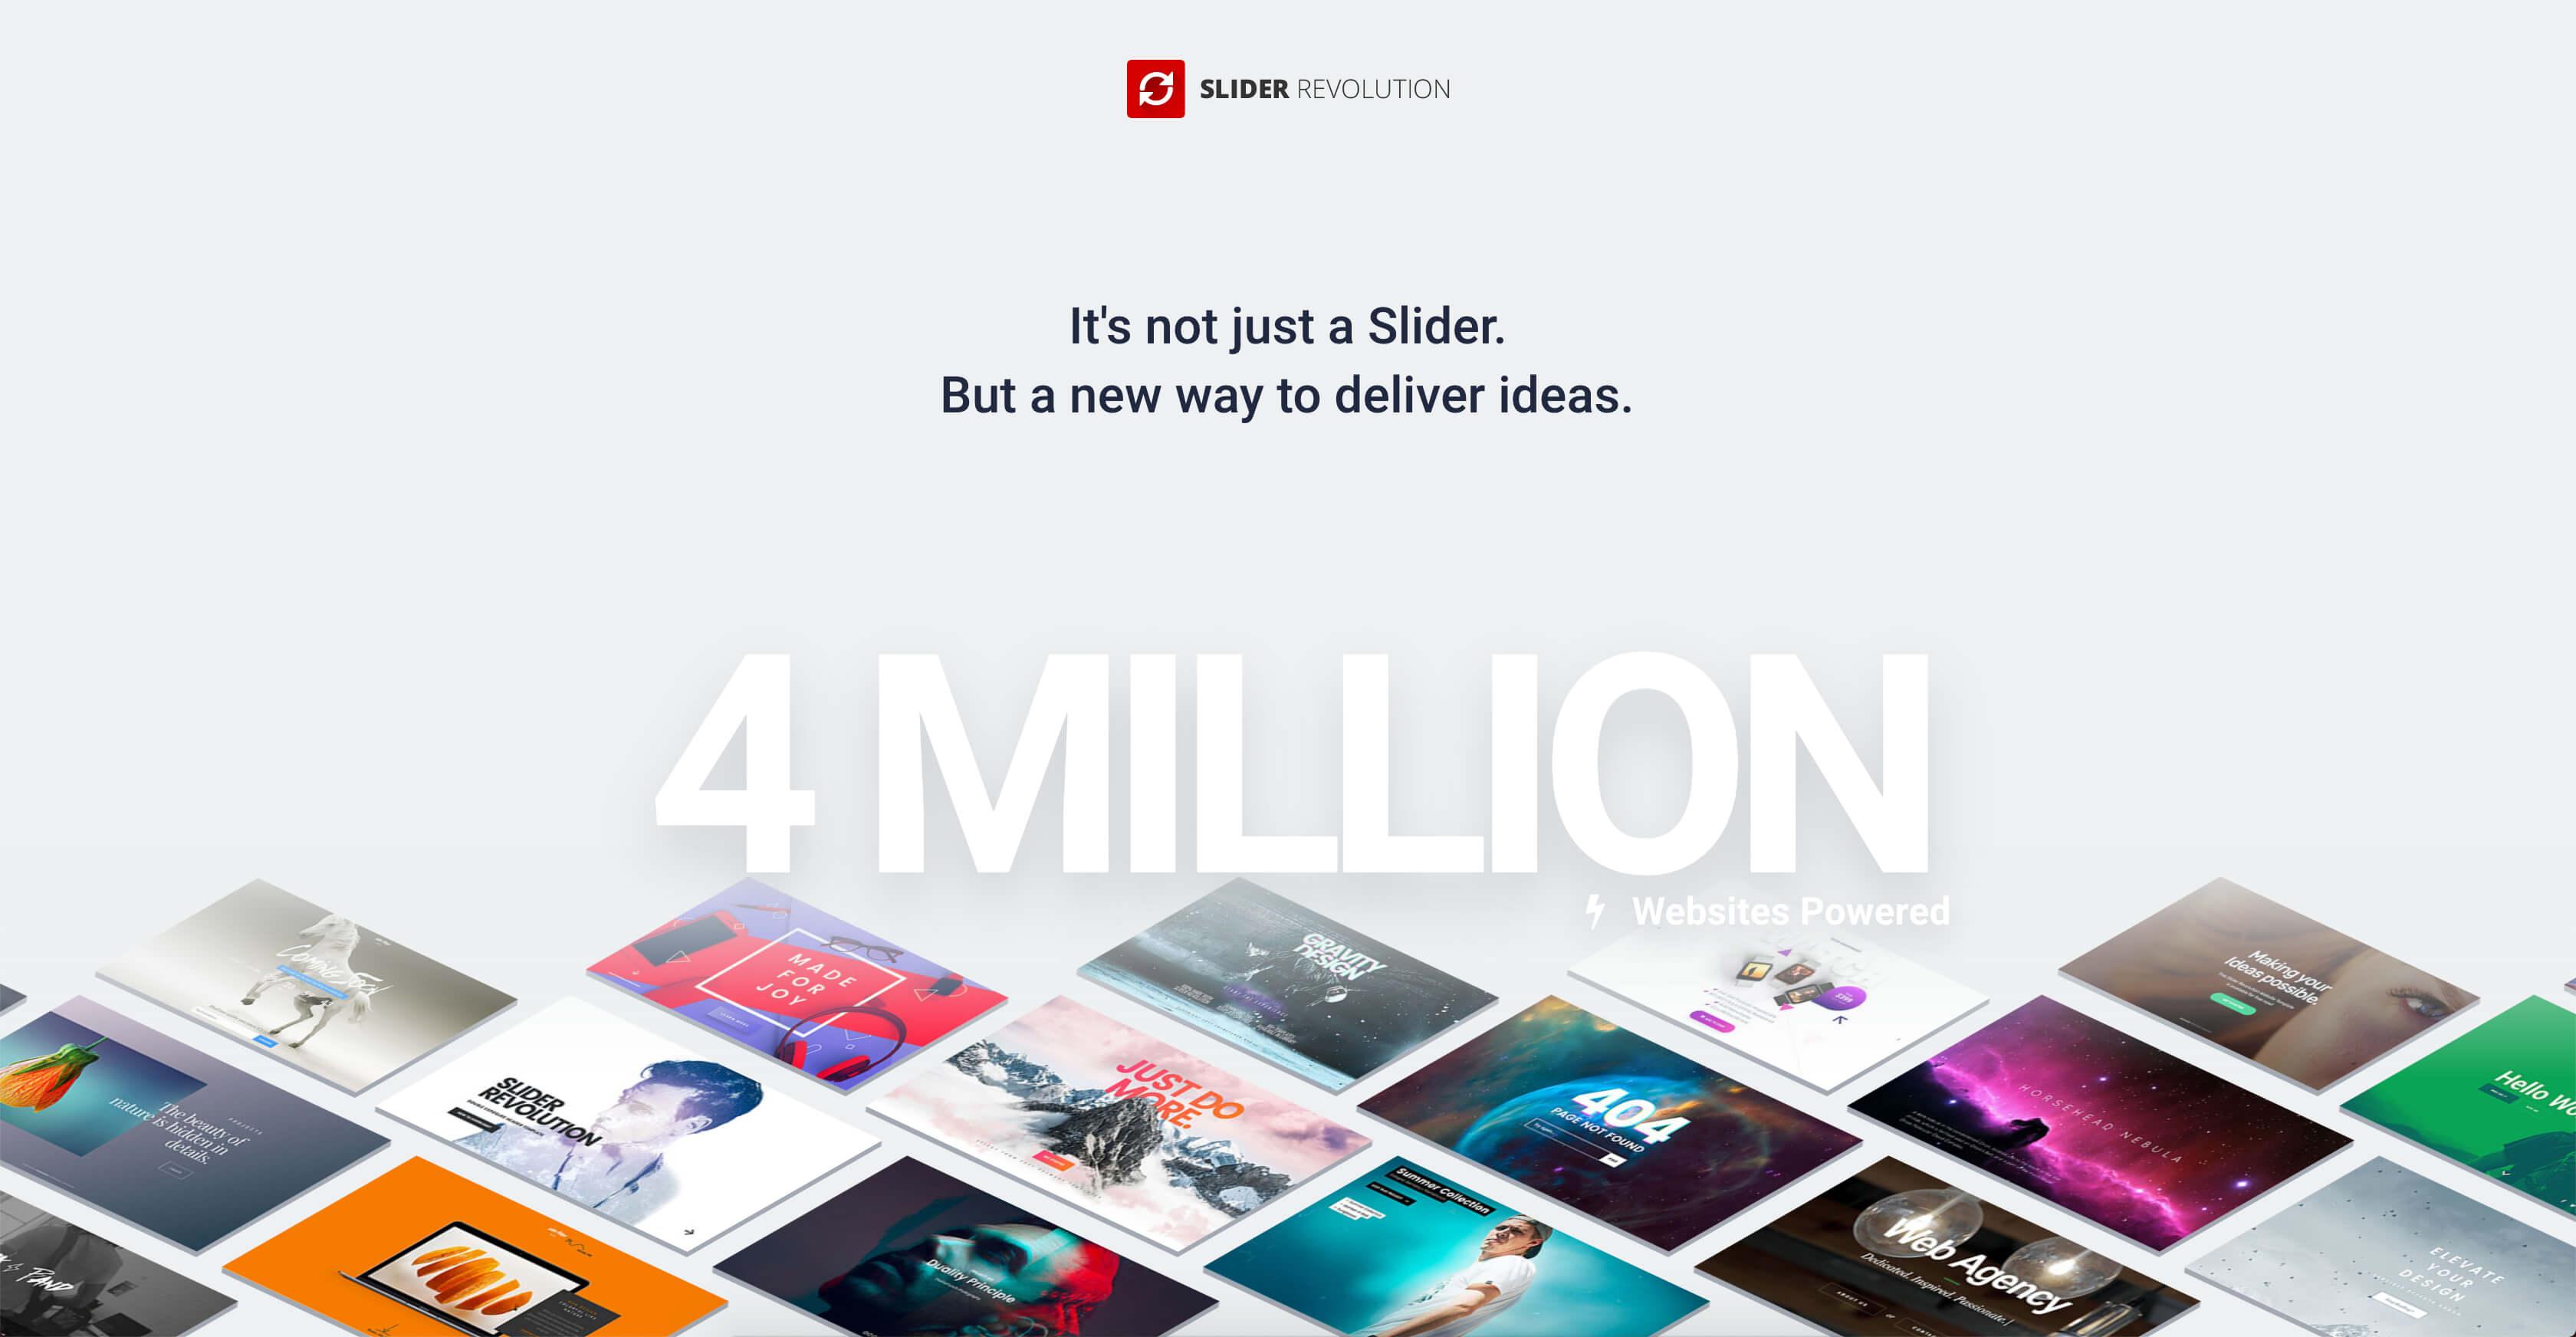 Slider Revolution – Documentation